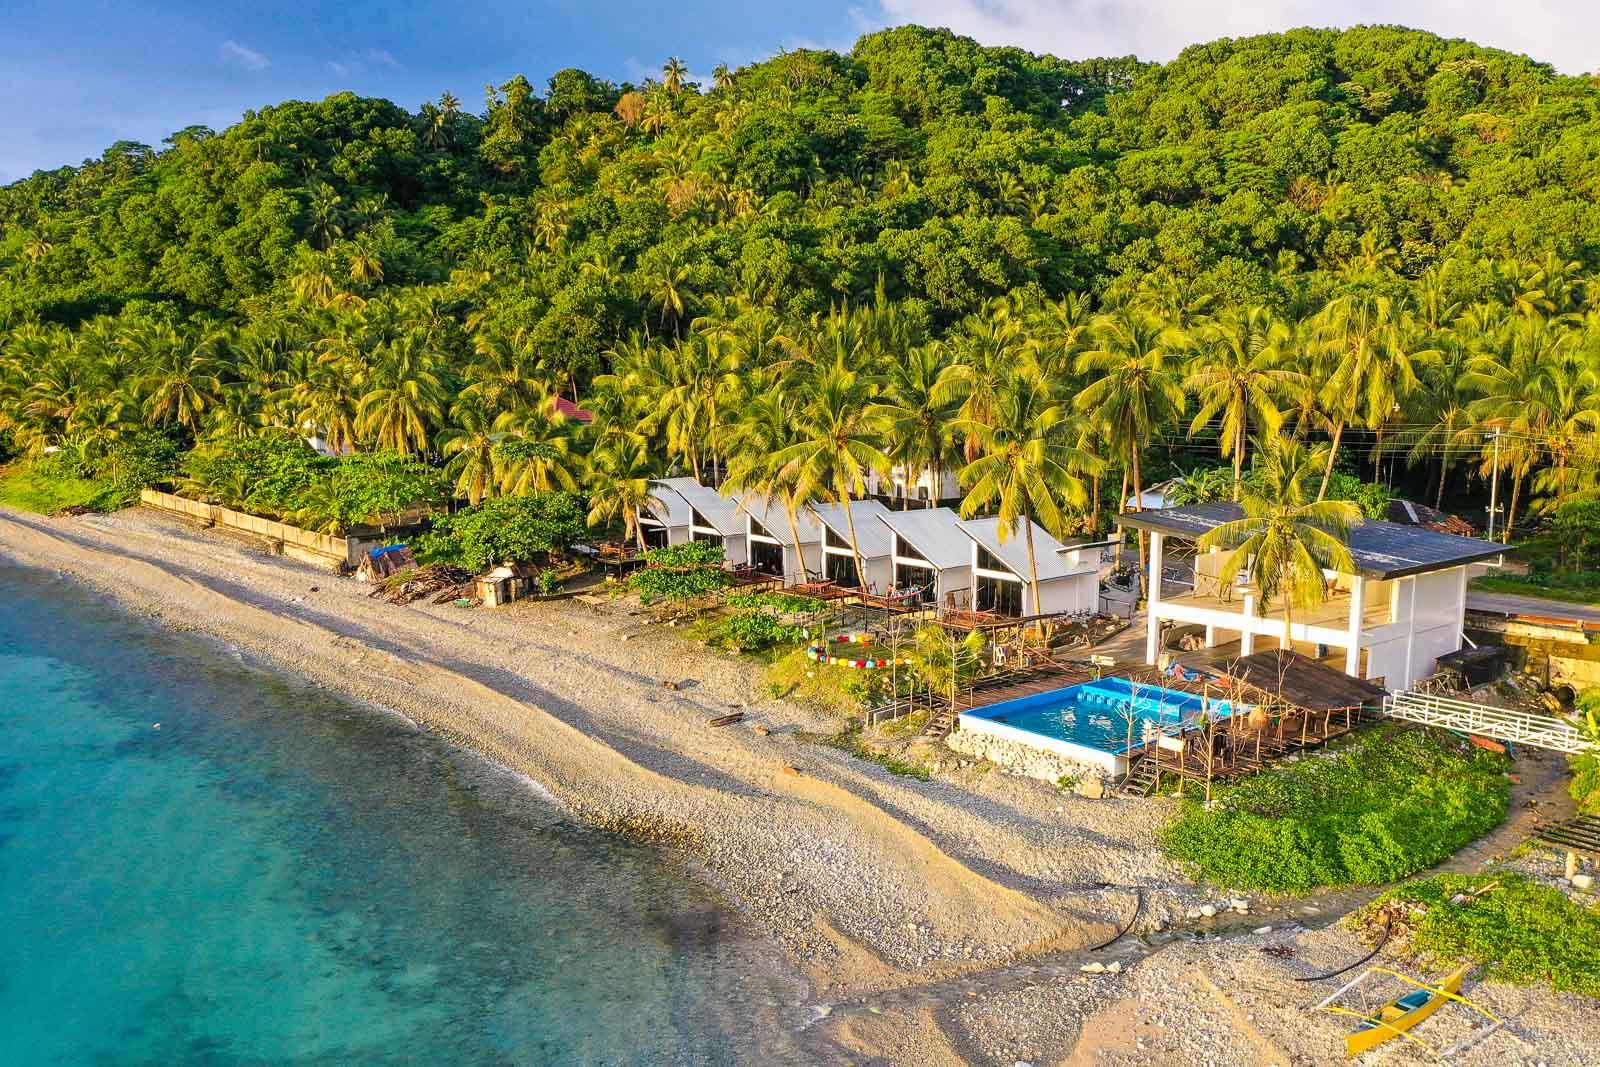 Surigao Beach Resort